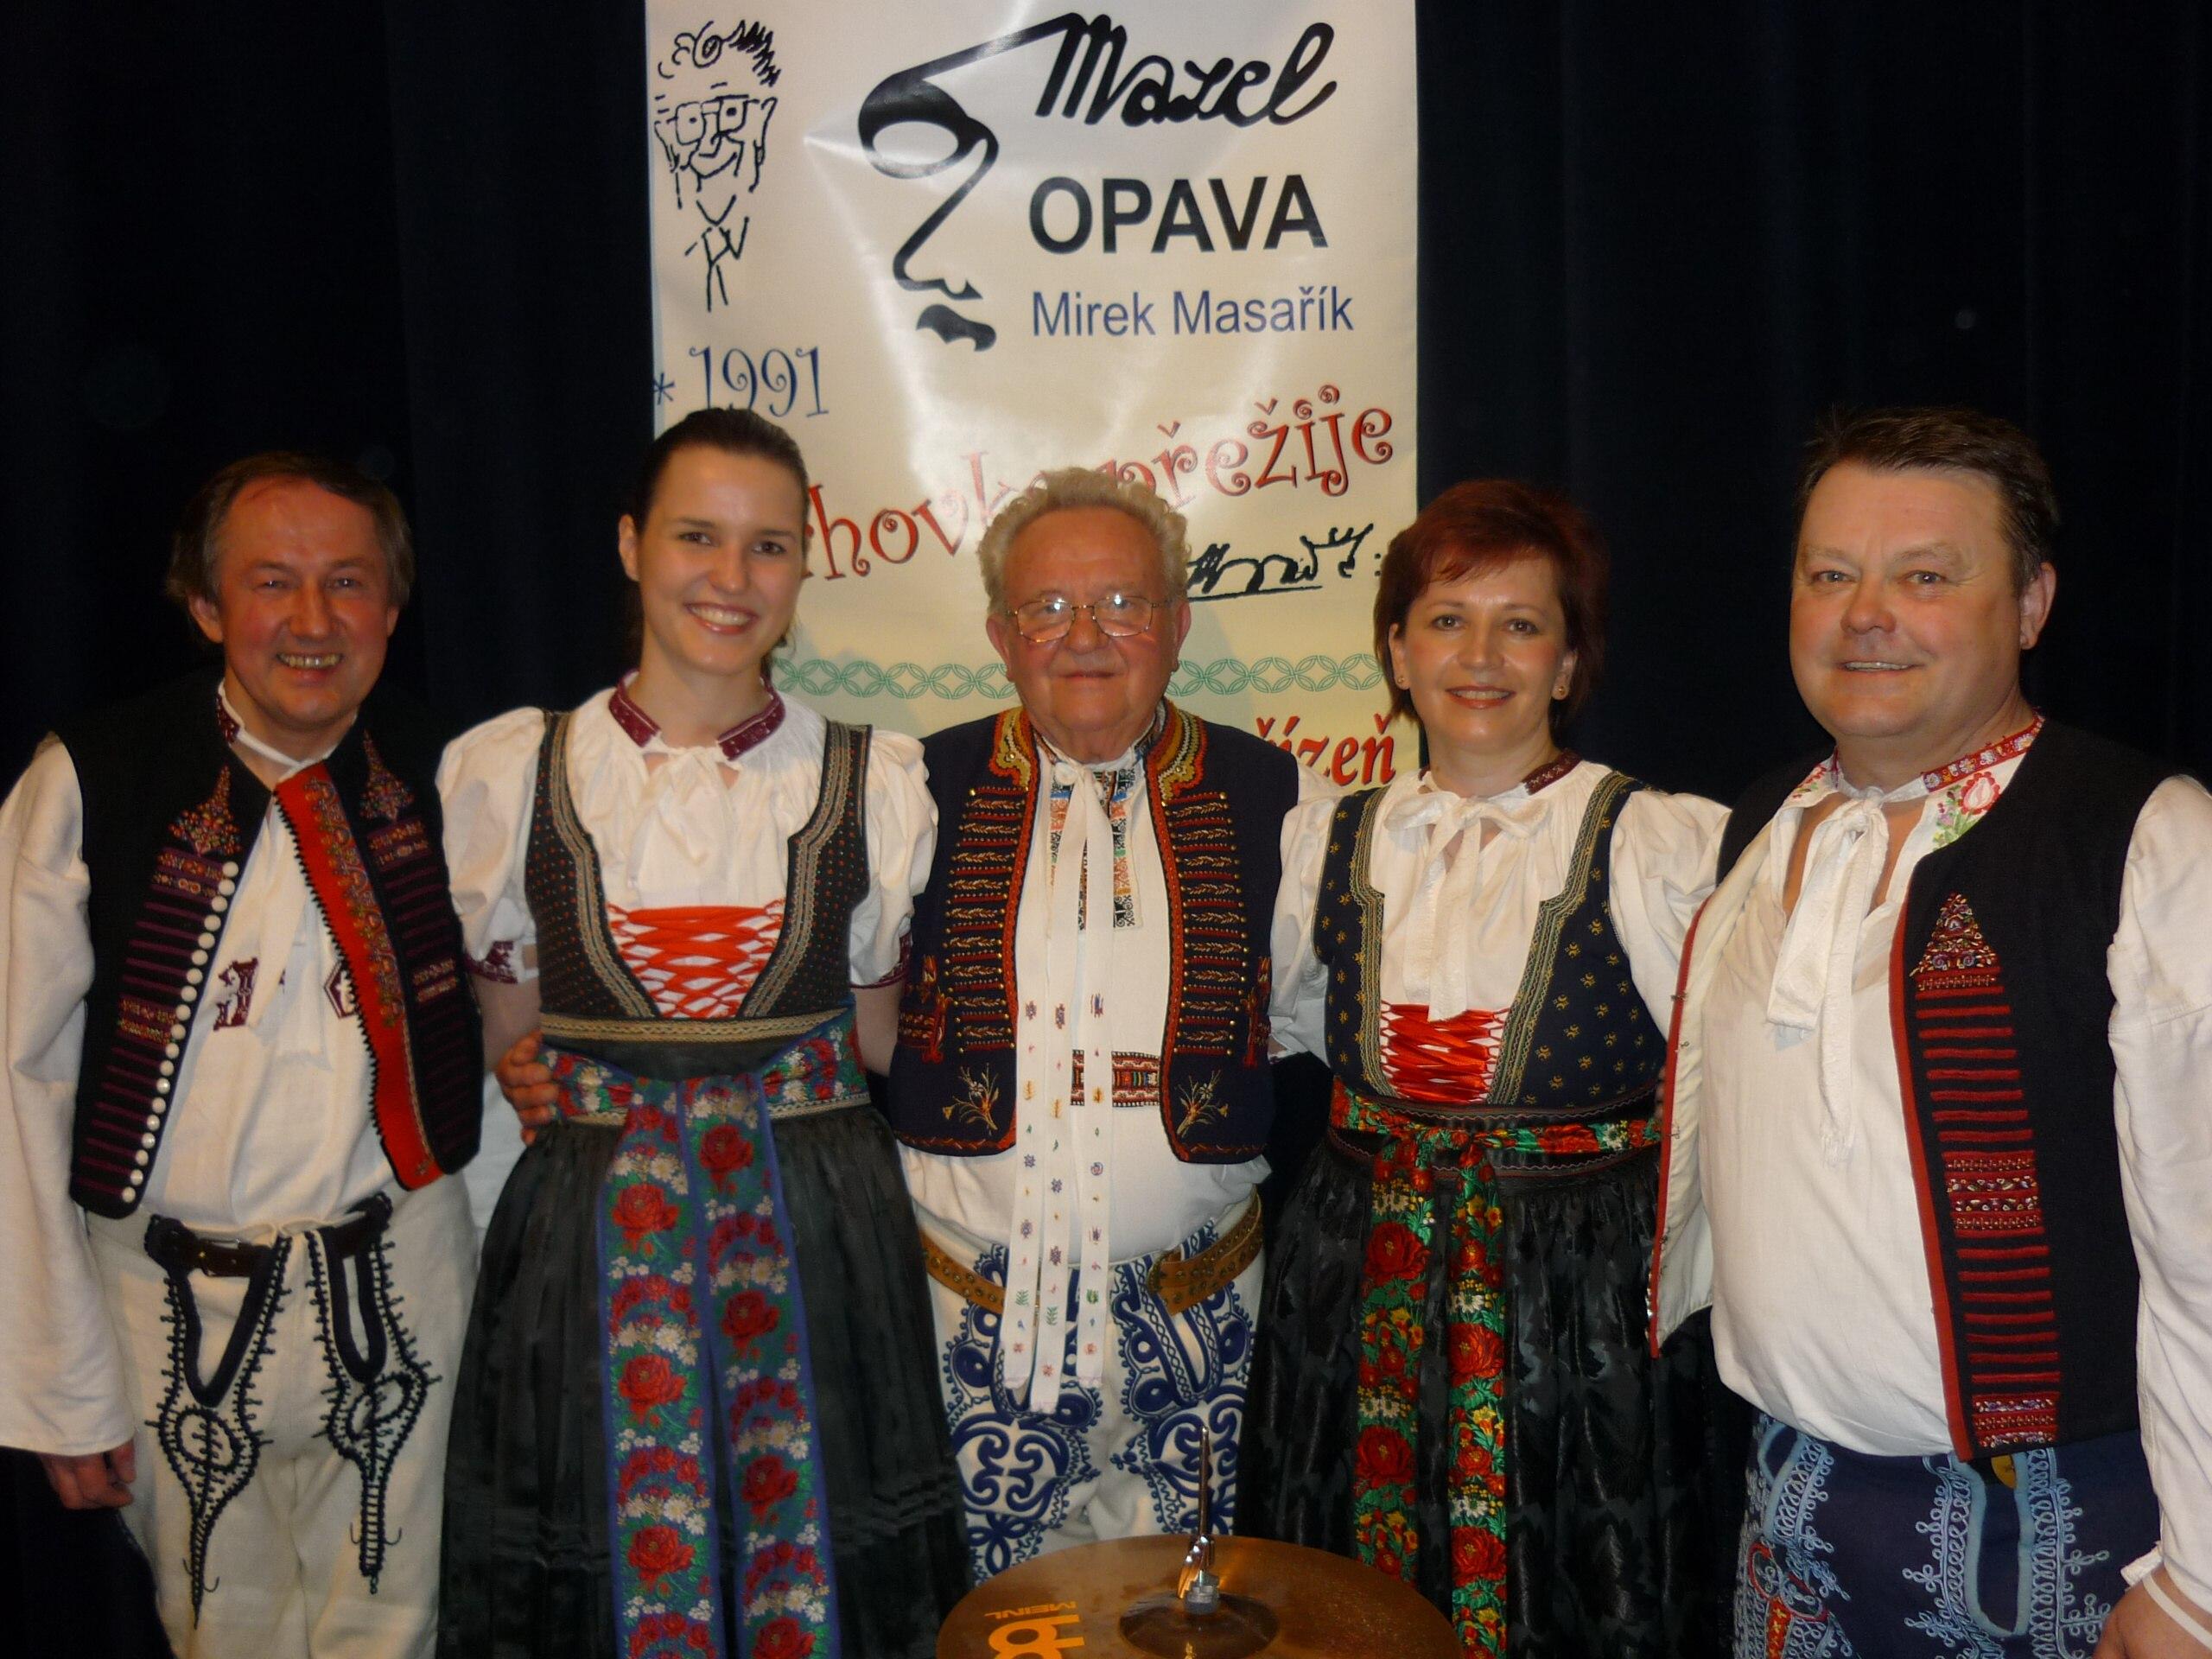 Opava (cz)